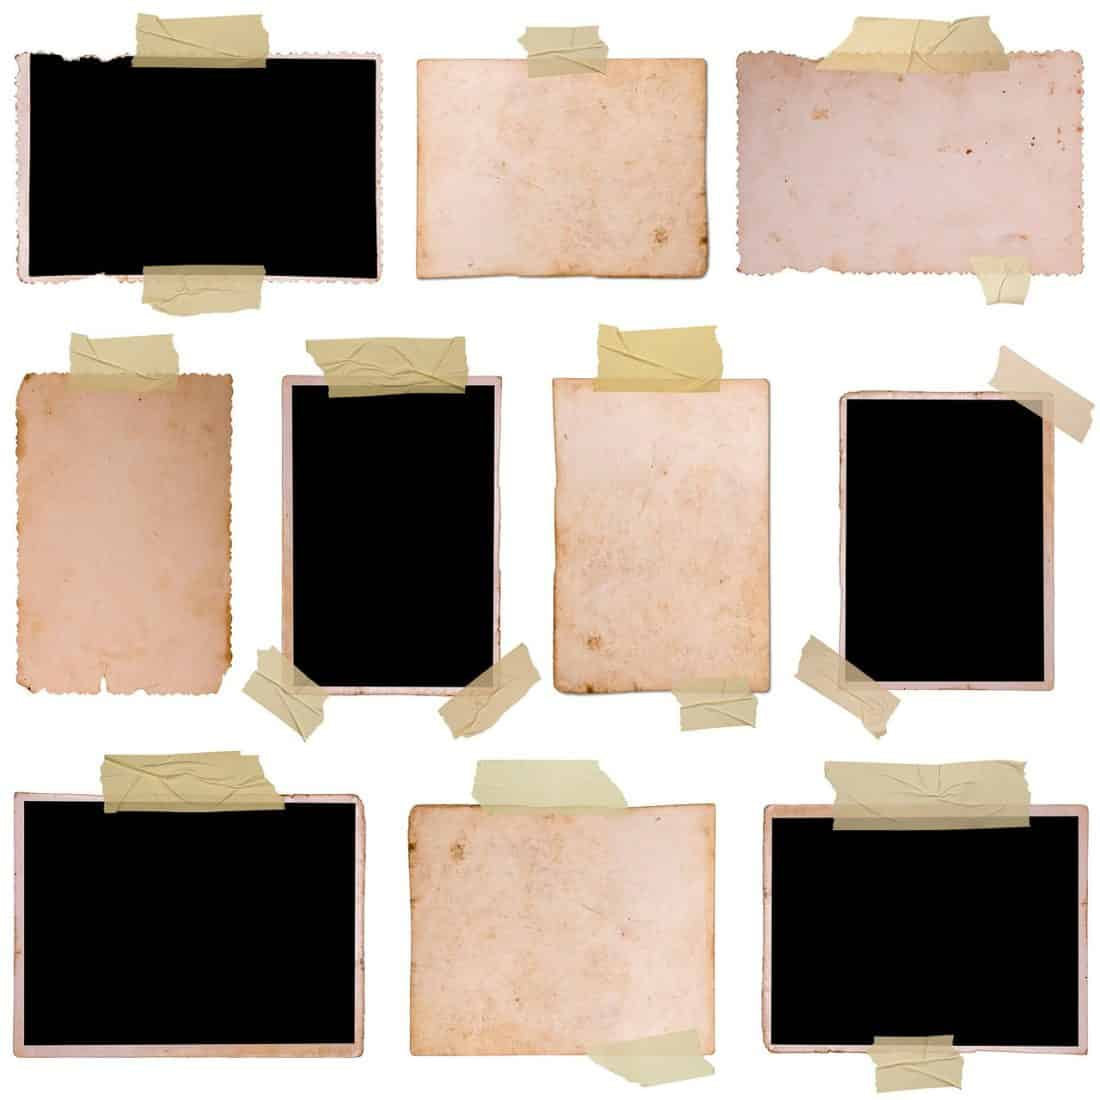 documents pixabay